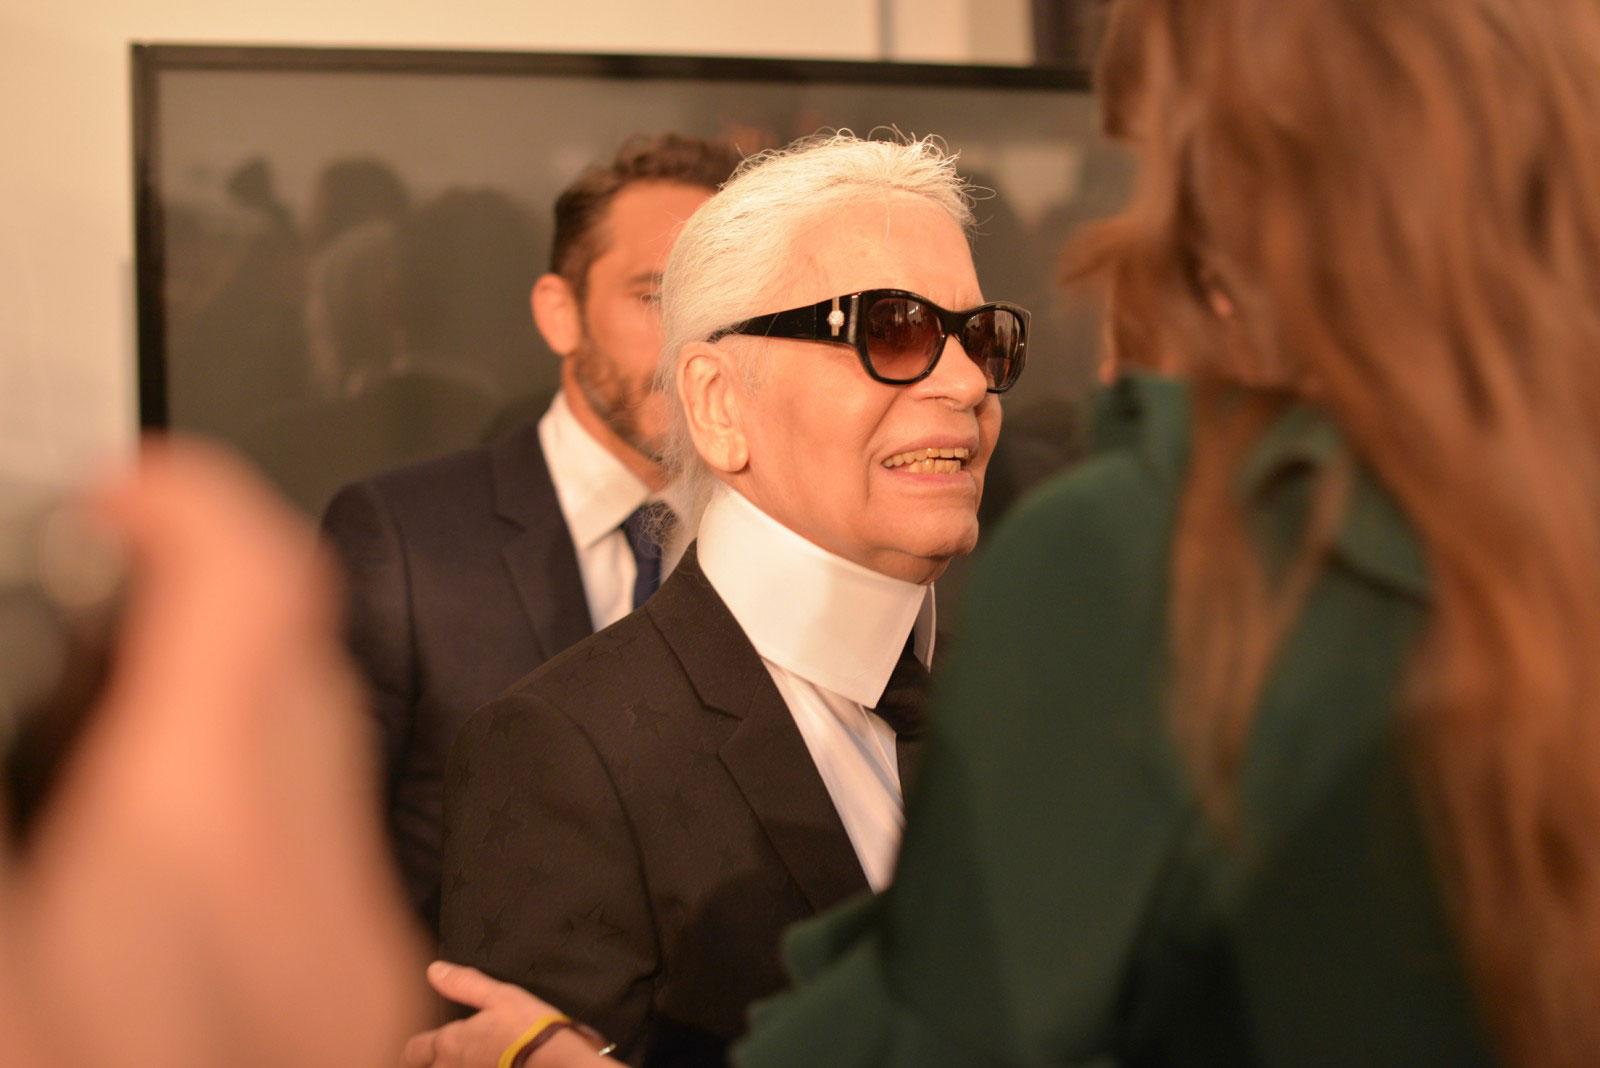 Karl Lagerfeld backstage at FENDI AW16